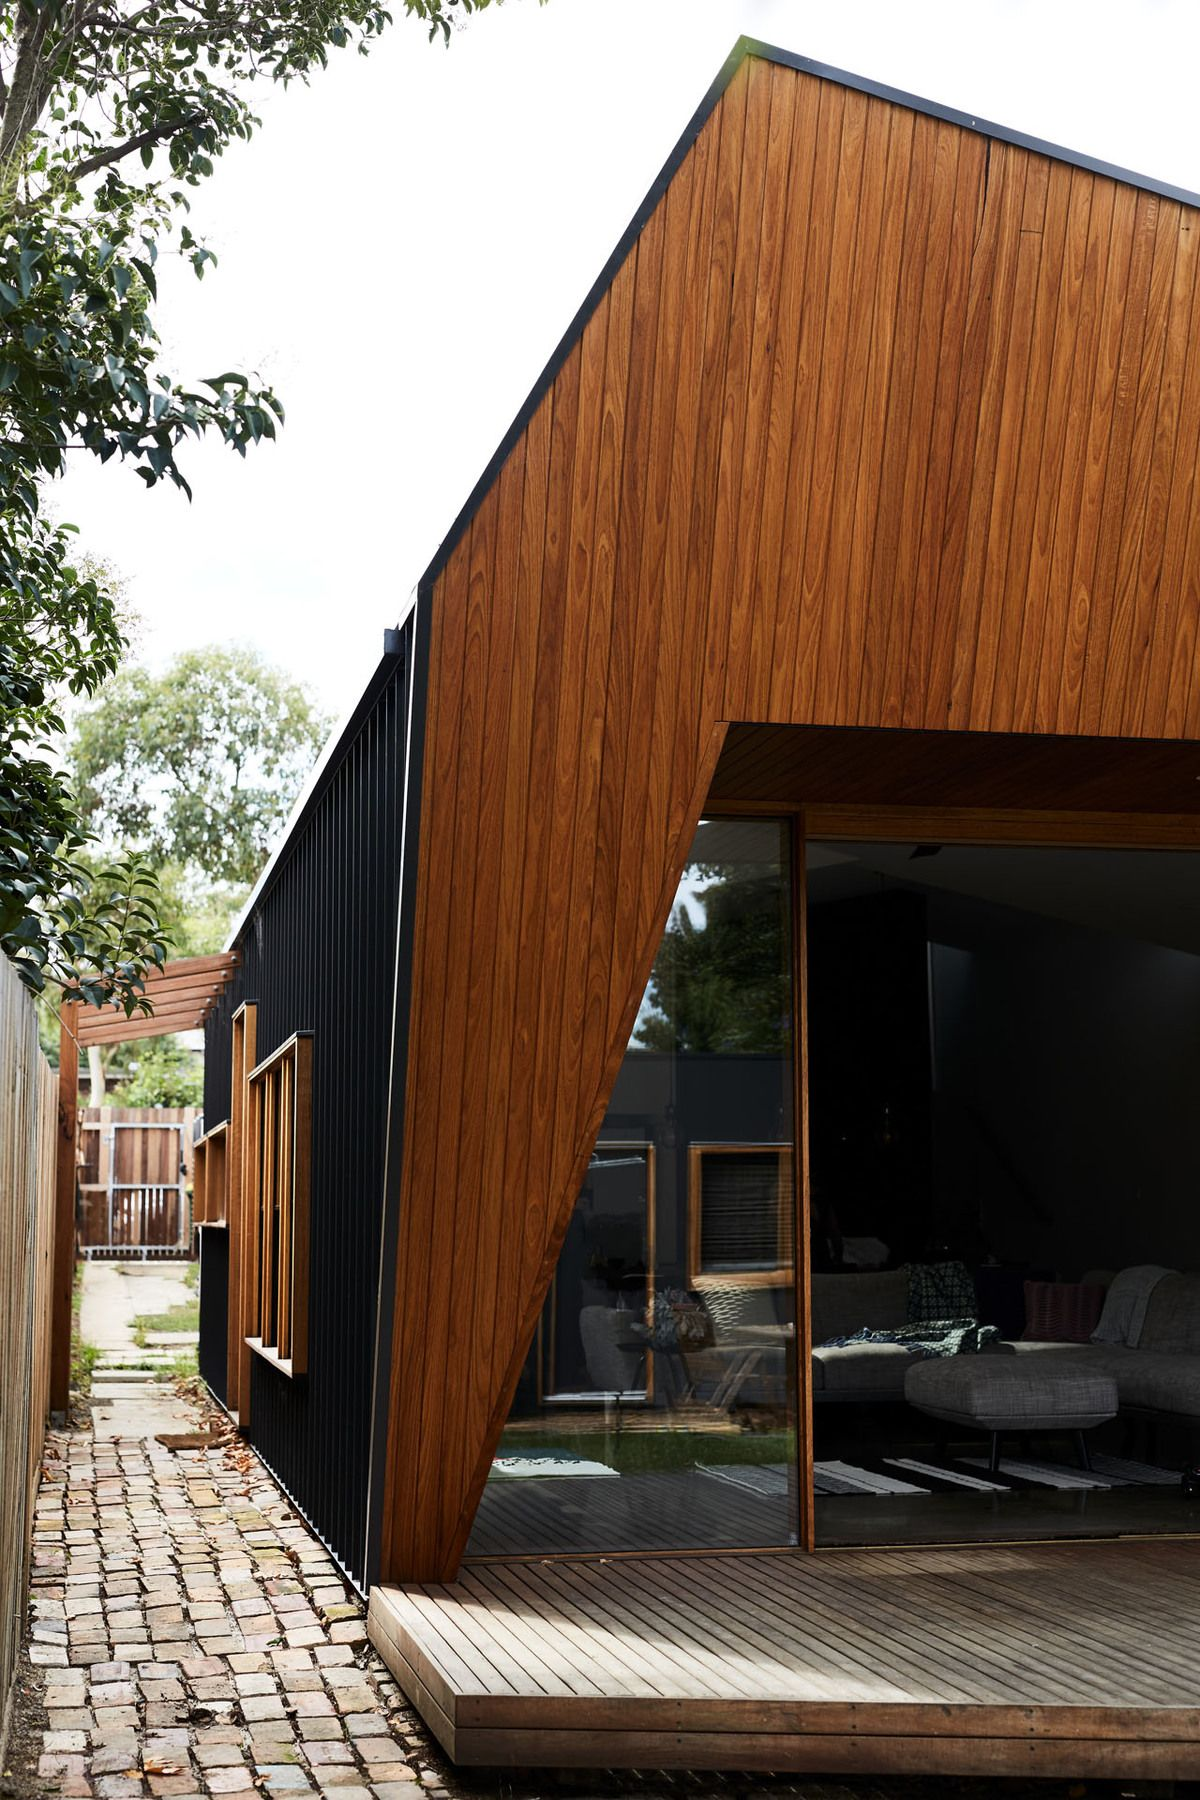 Split Roof Design: Split End House's Cranking And Splitting Roof Lets Light